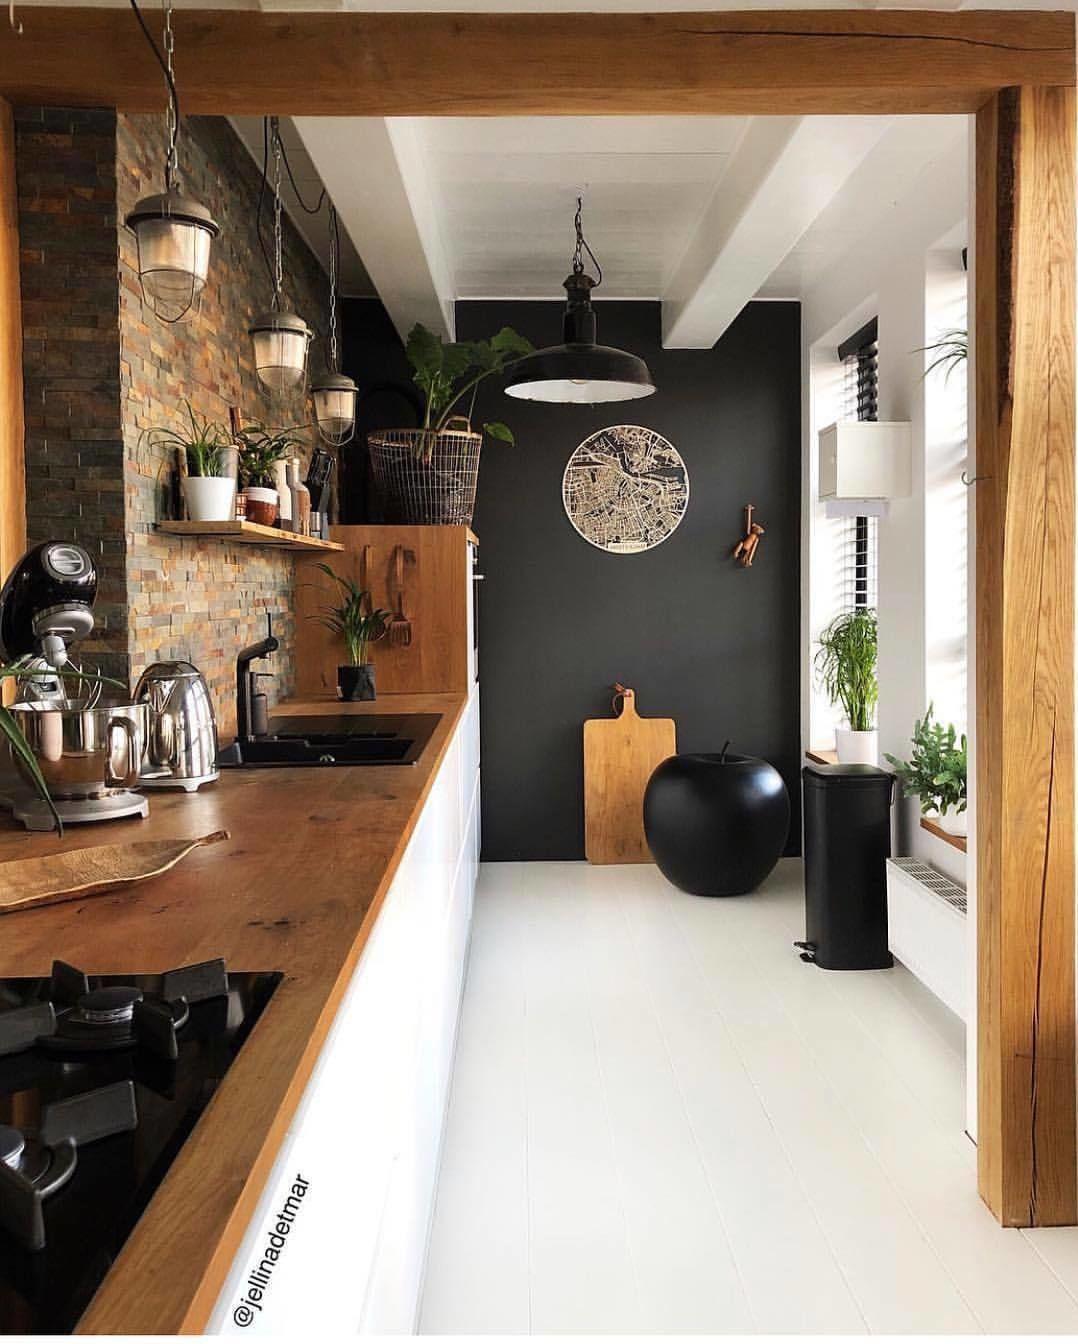 Inspiring kitchen black paint accent wall by jellinadetmar also best small design ideas studios in rh pinterest